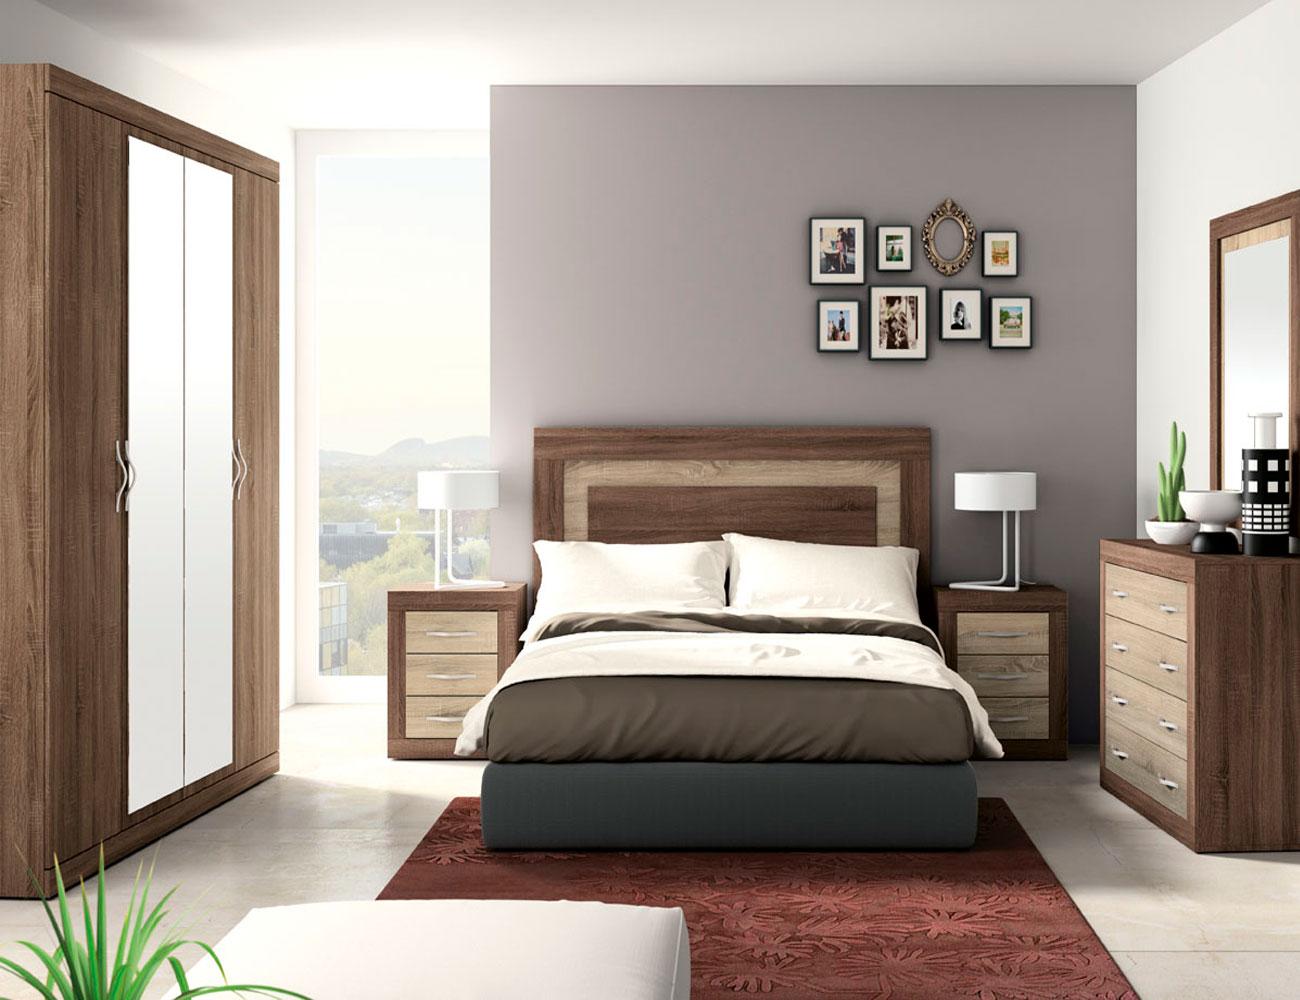 287 dormitorio matrimonio britannia cambrian